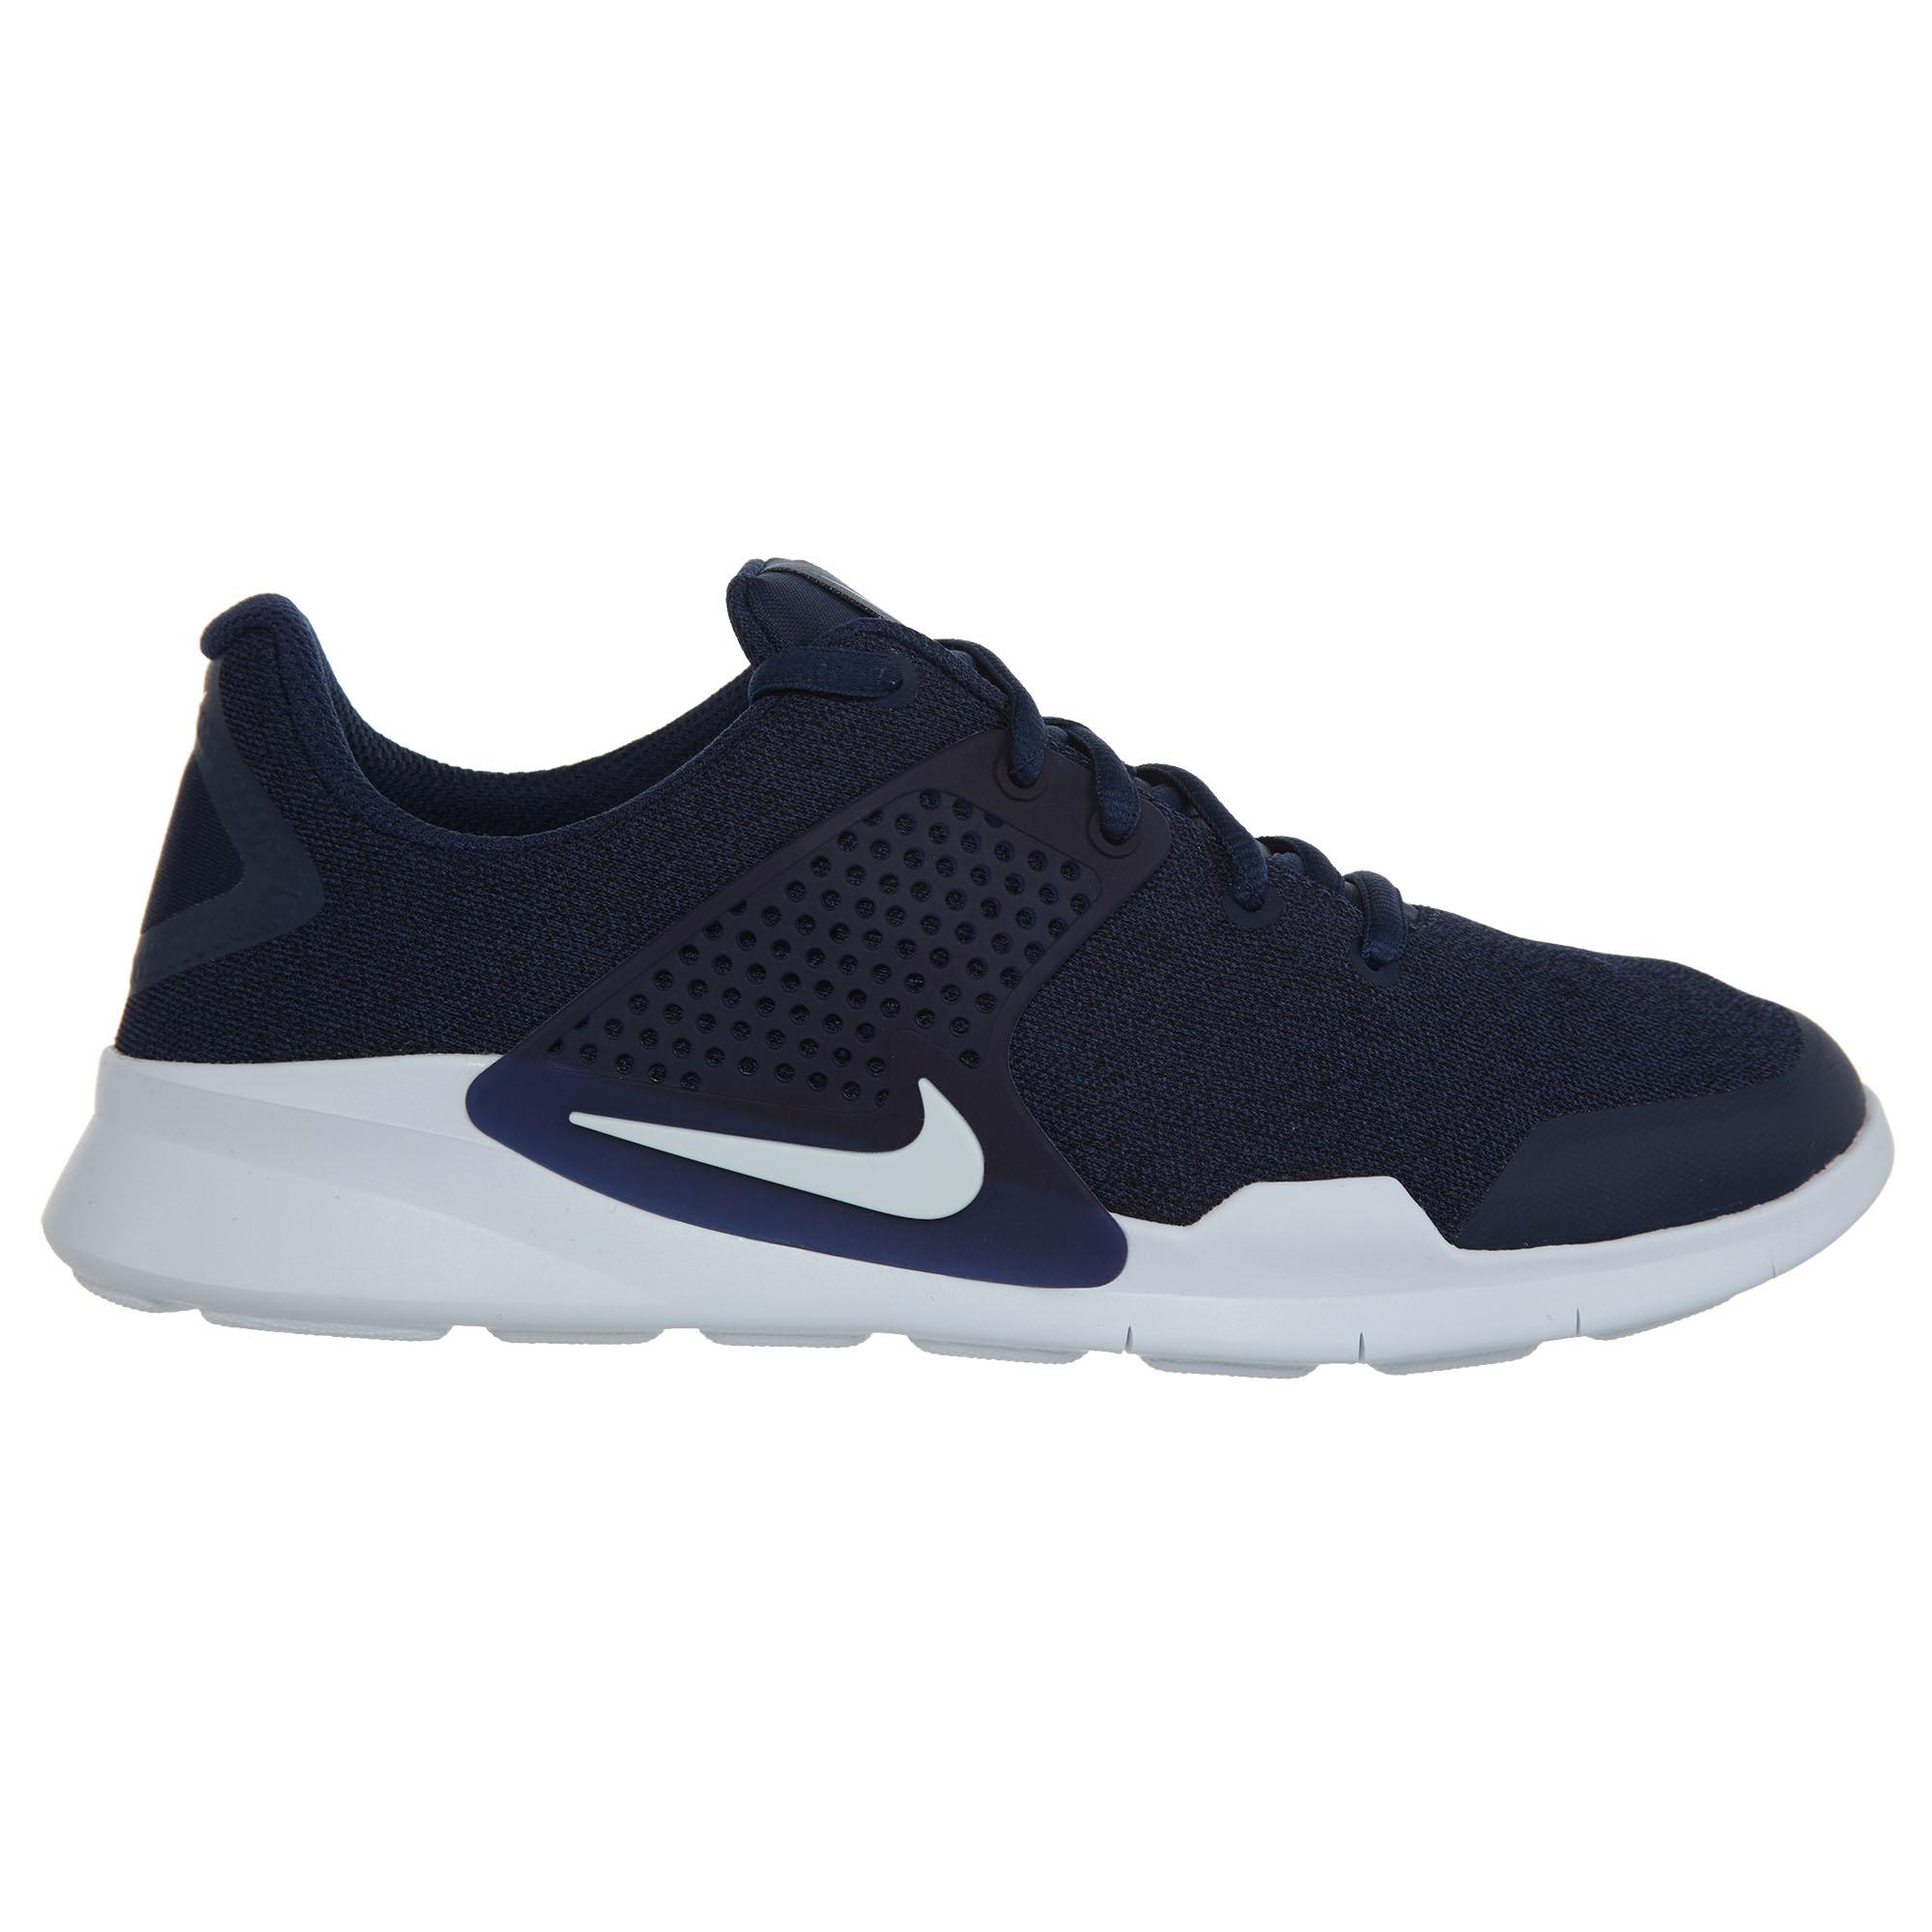 Nike Arrowz Midnight Navy White-Black